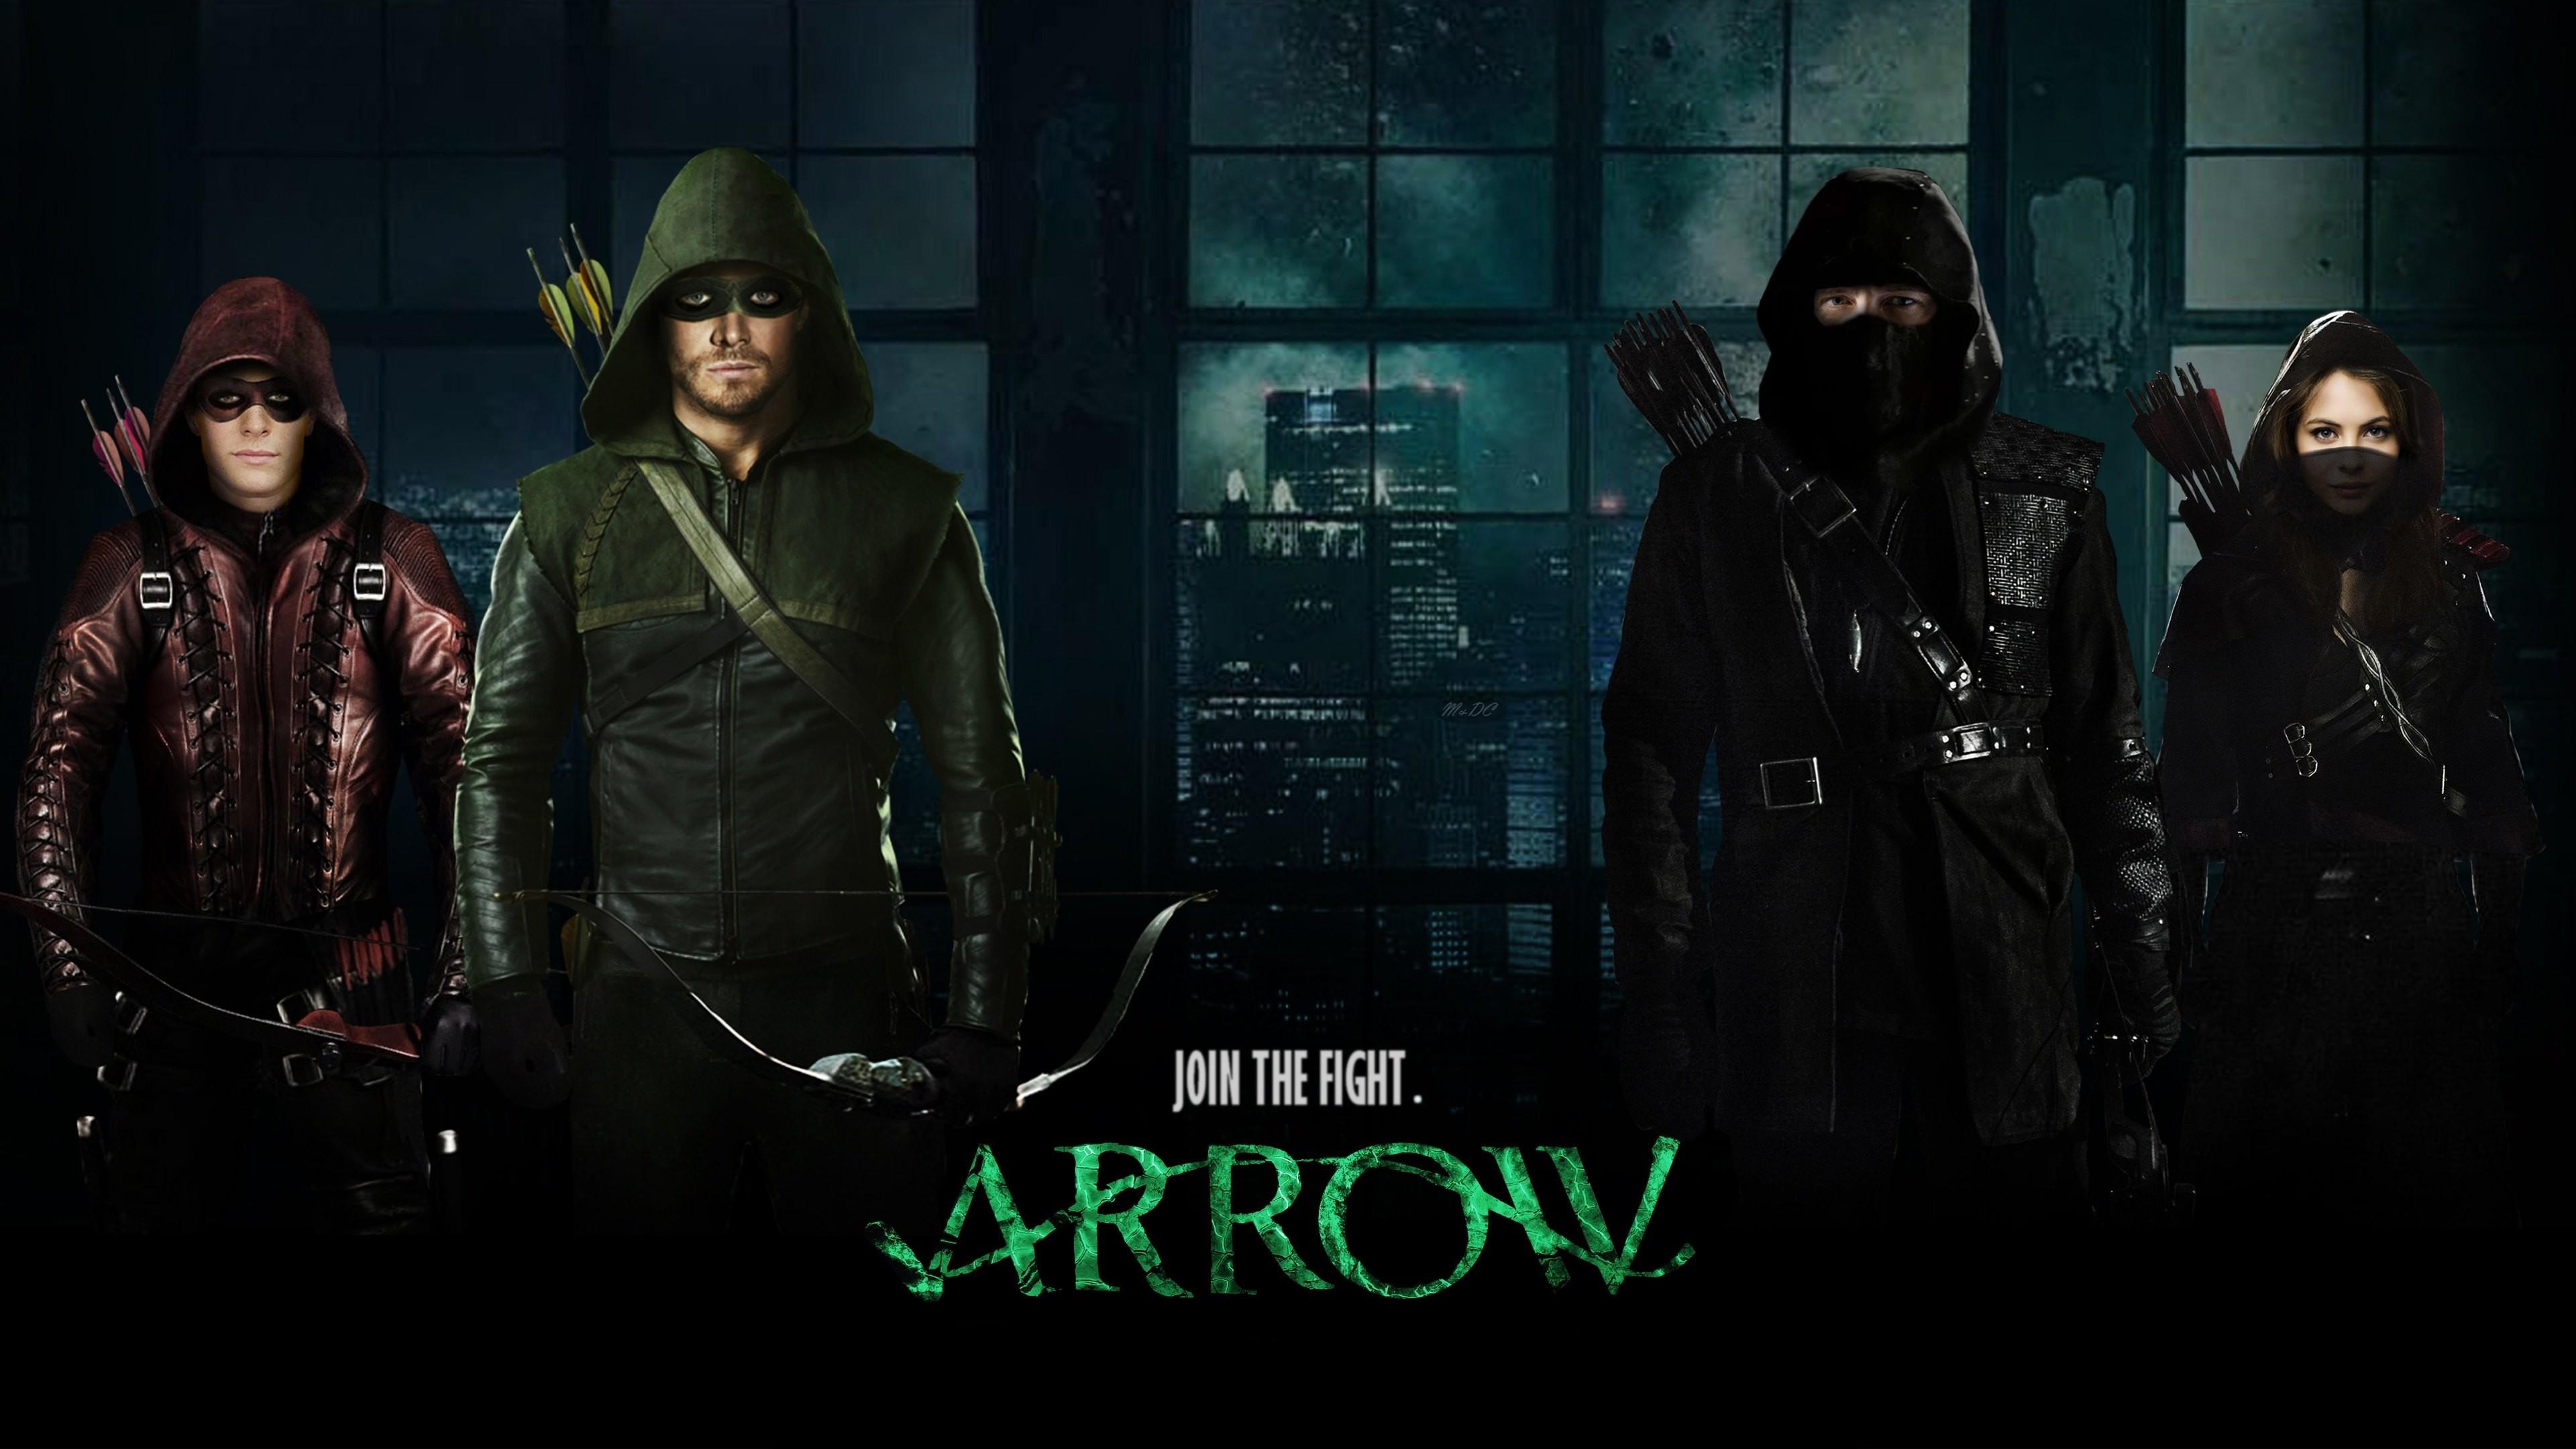 Arrow TV Series HD Wallpapers. 4K Wallpapers